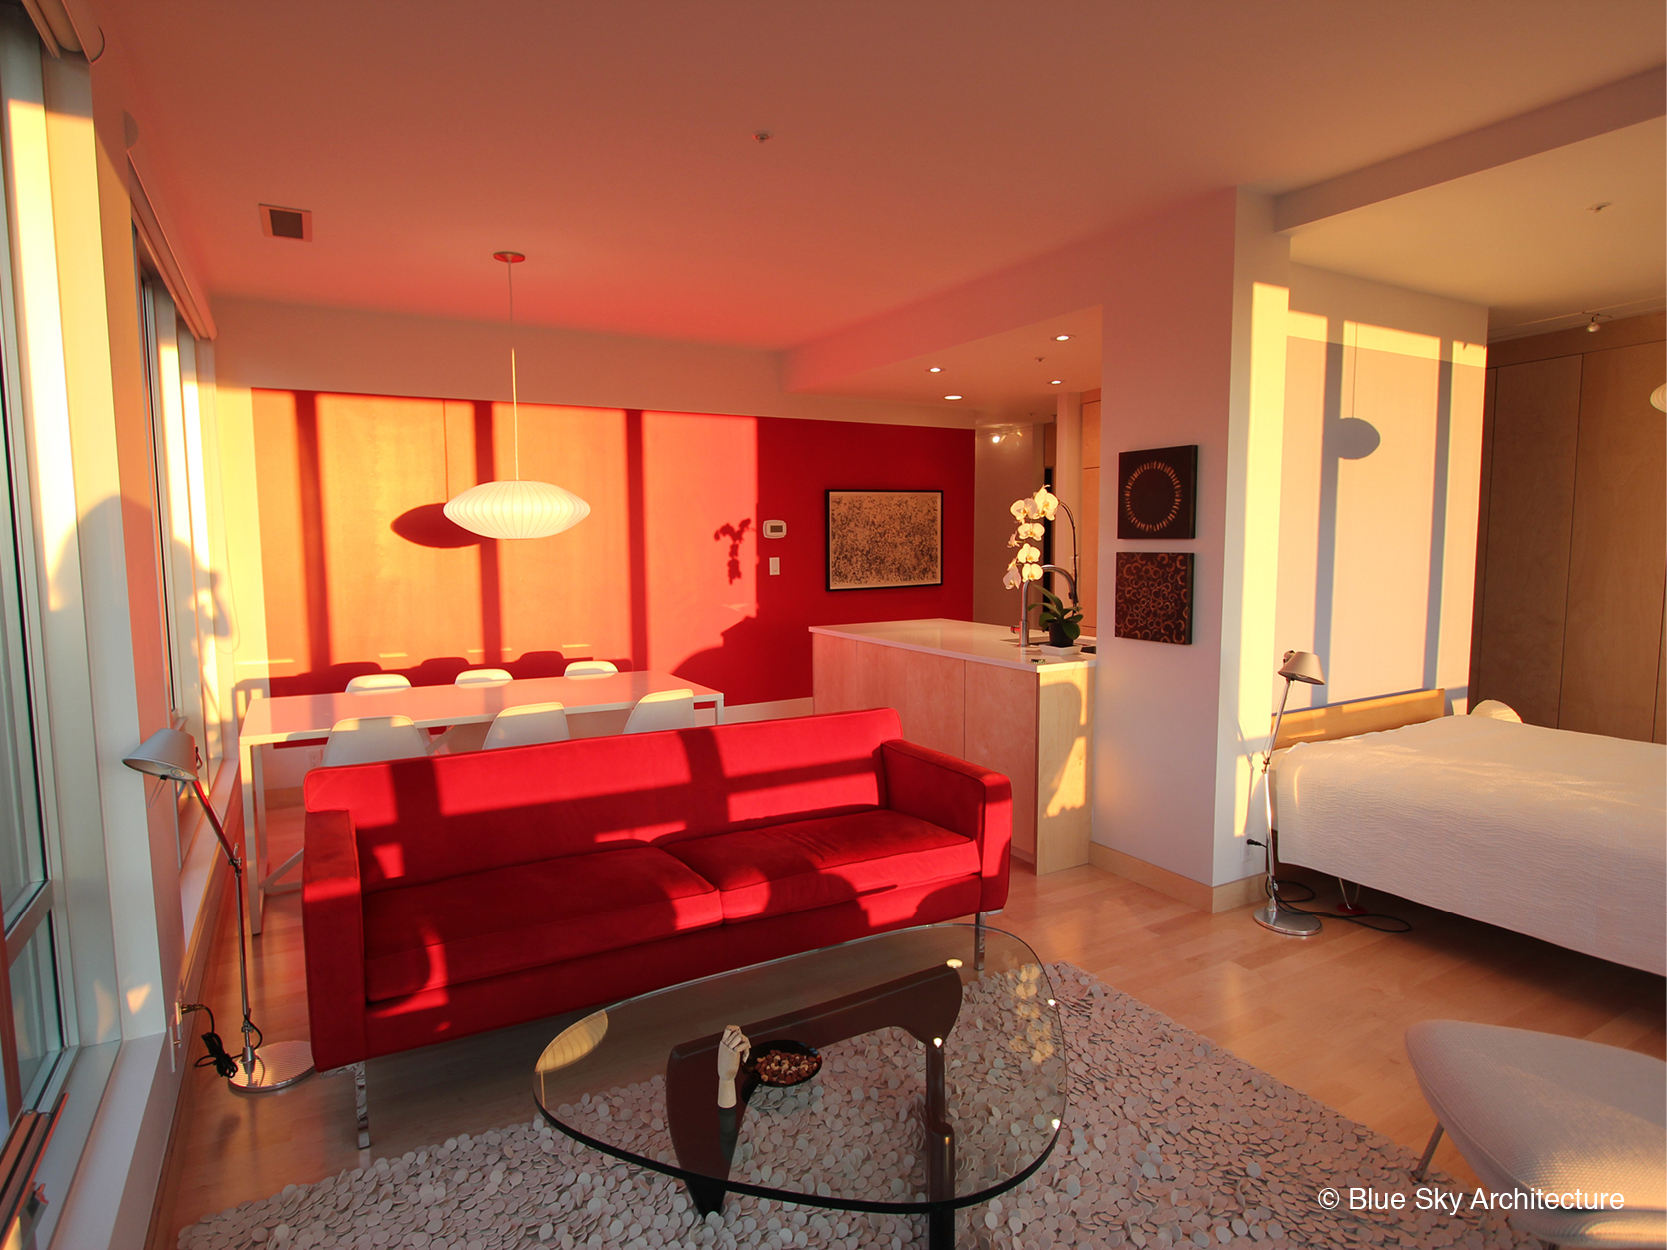 Vancouver studio condo with open concept bedroom